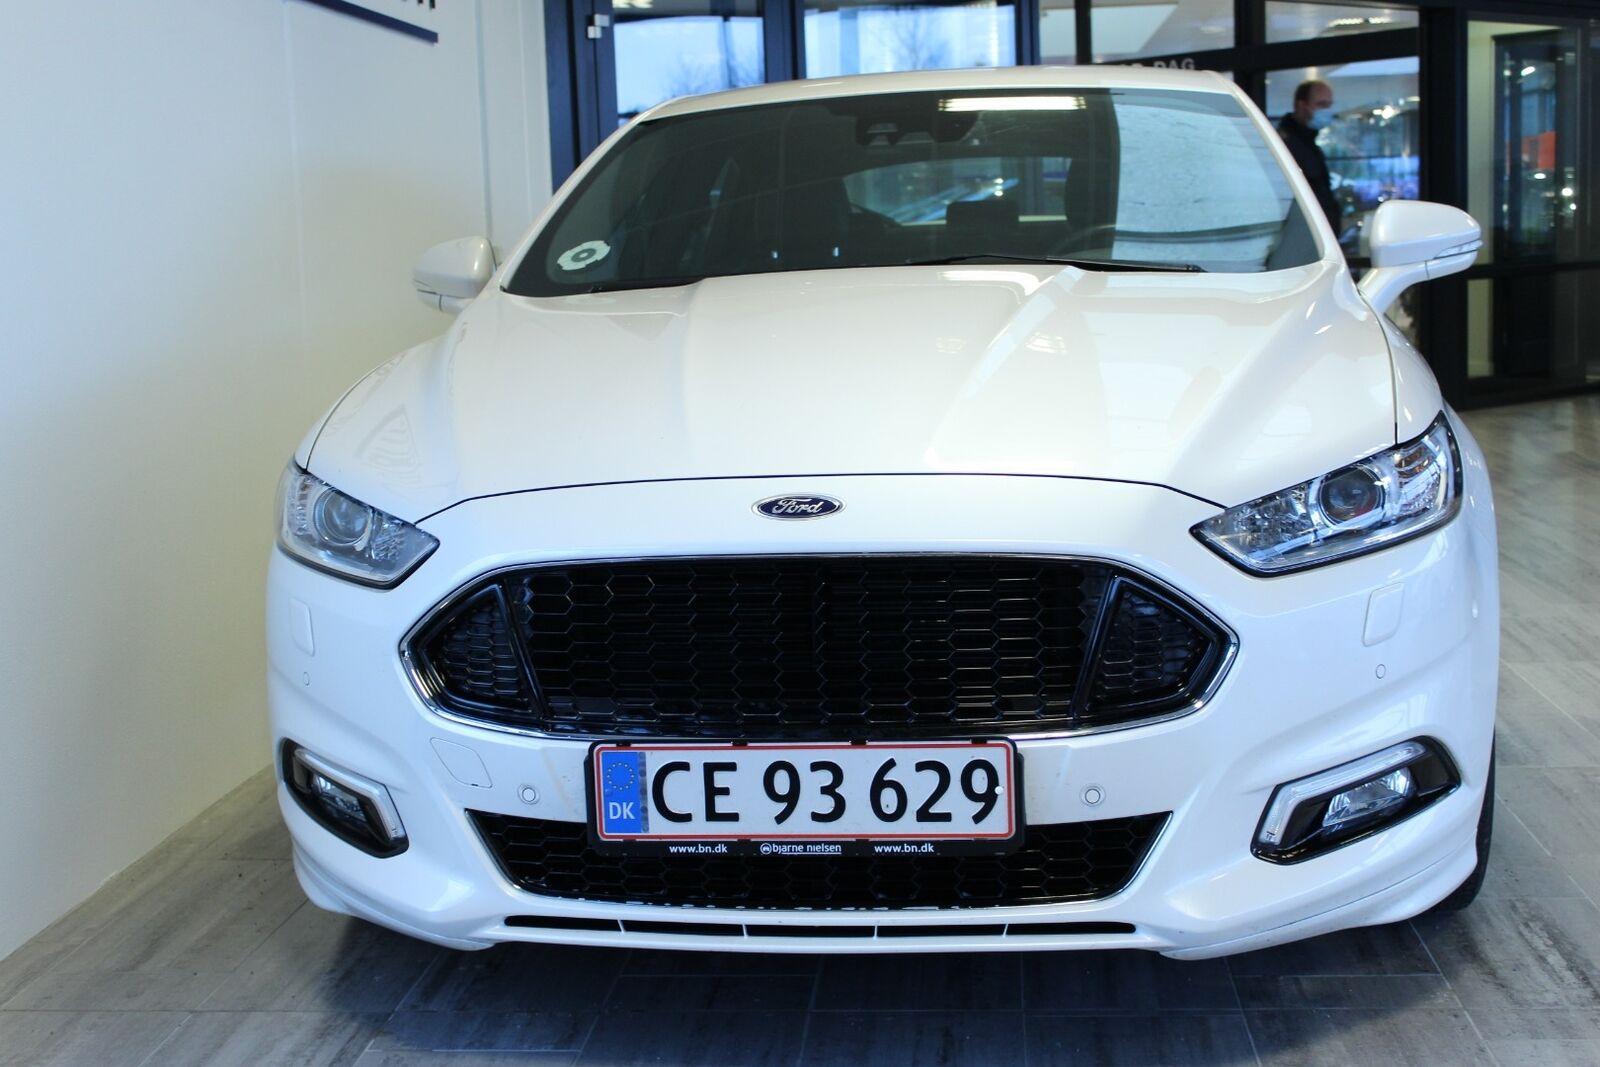 Ford Mondeo 1,5 SCTi 160 ST-Line aut. - billede 2